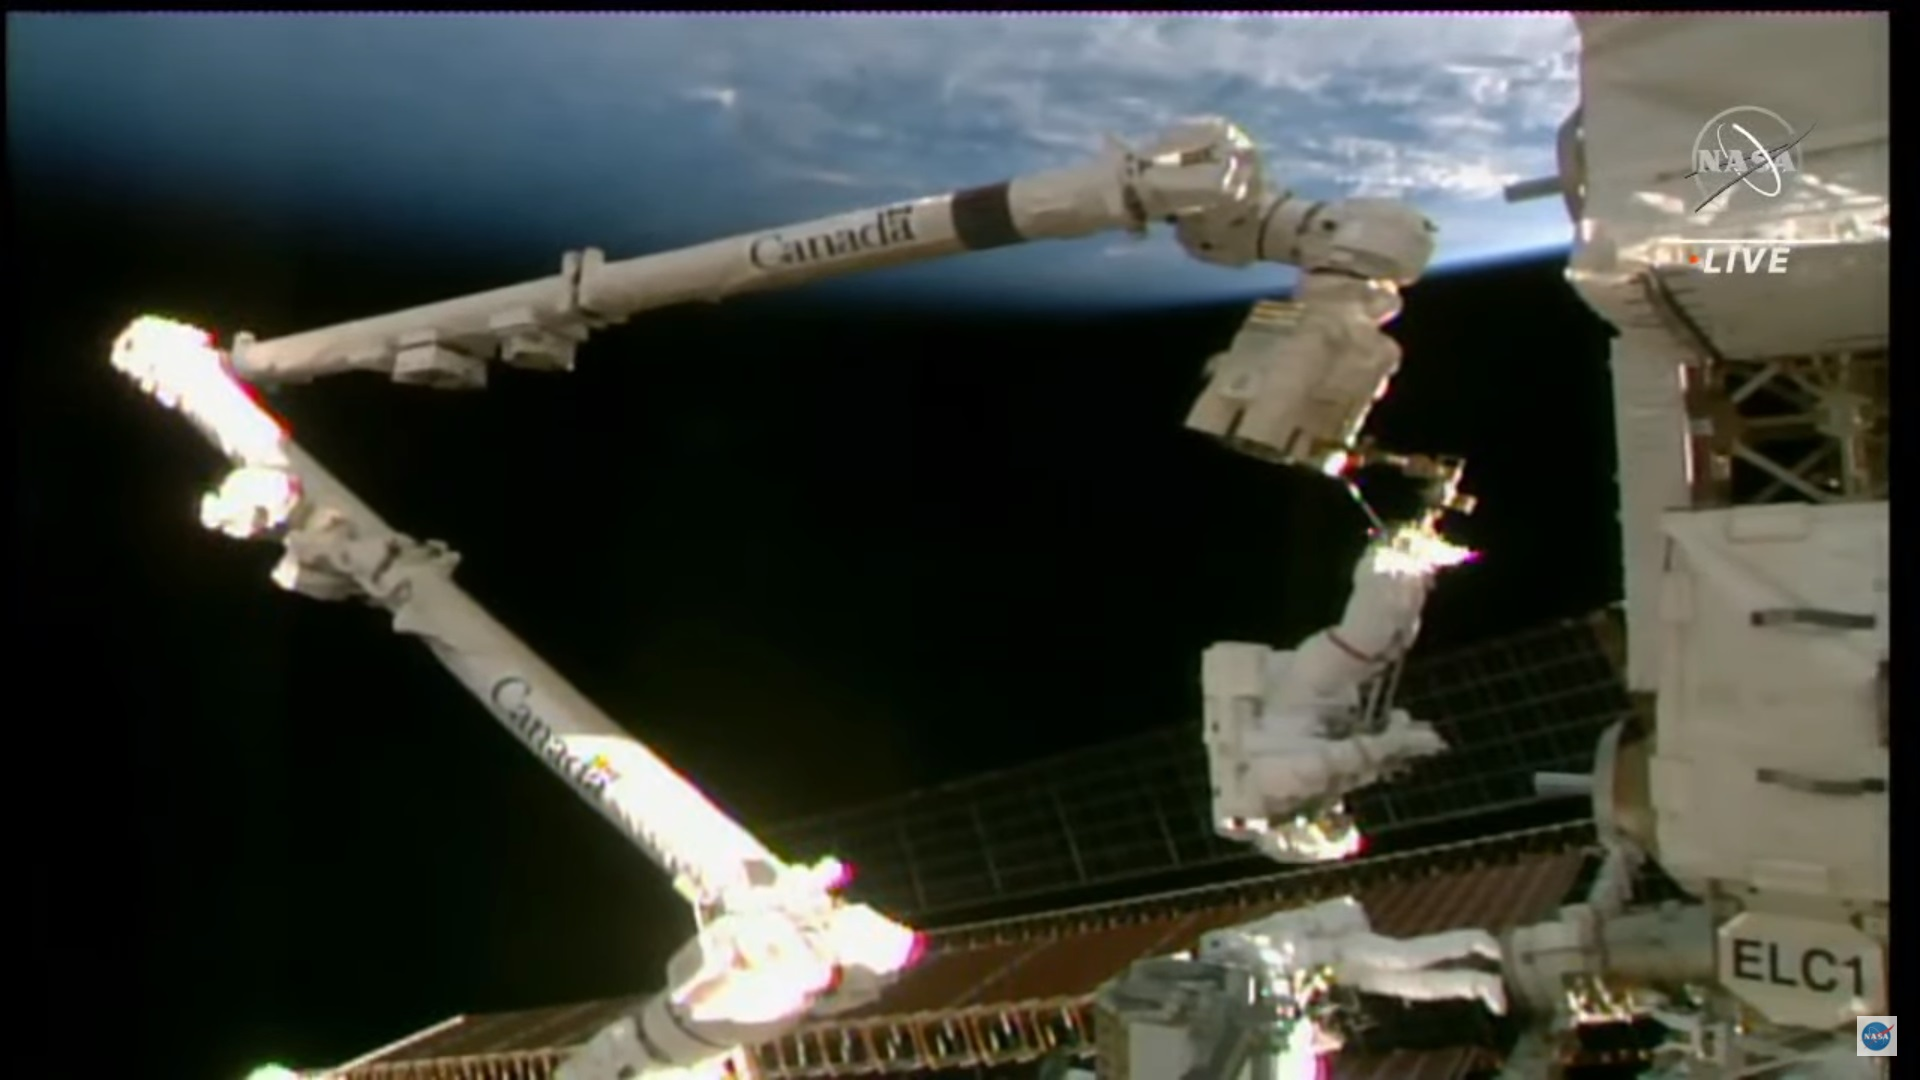 2021-25-june-pesquet-spacewalking.jpg